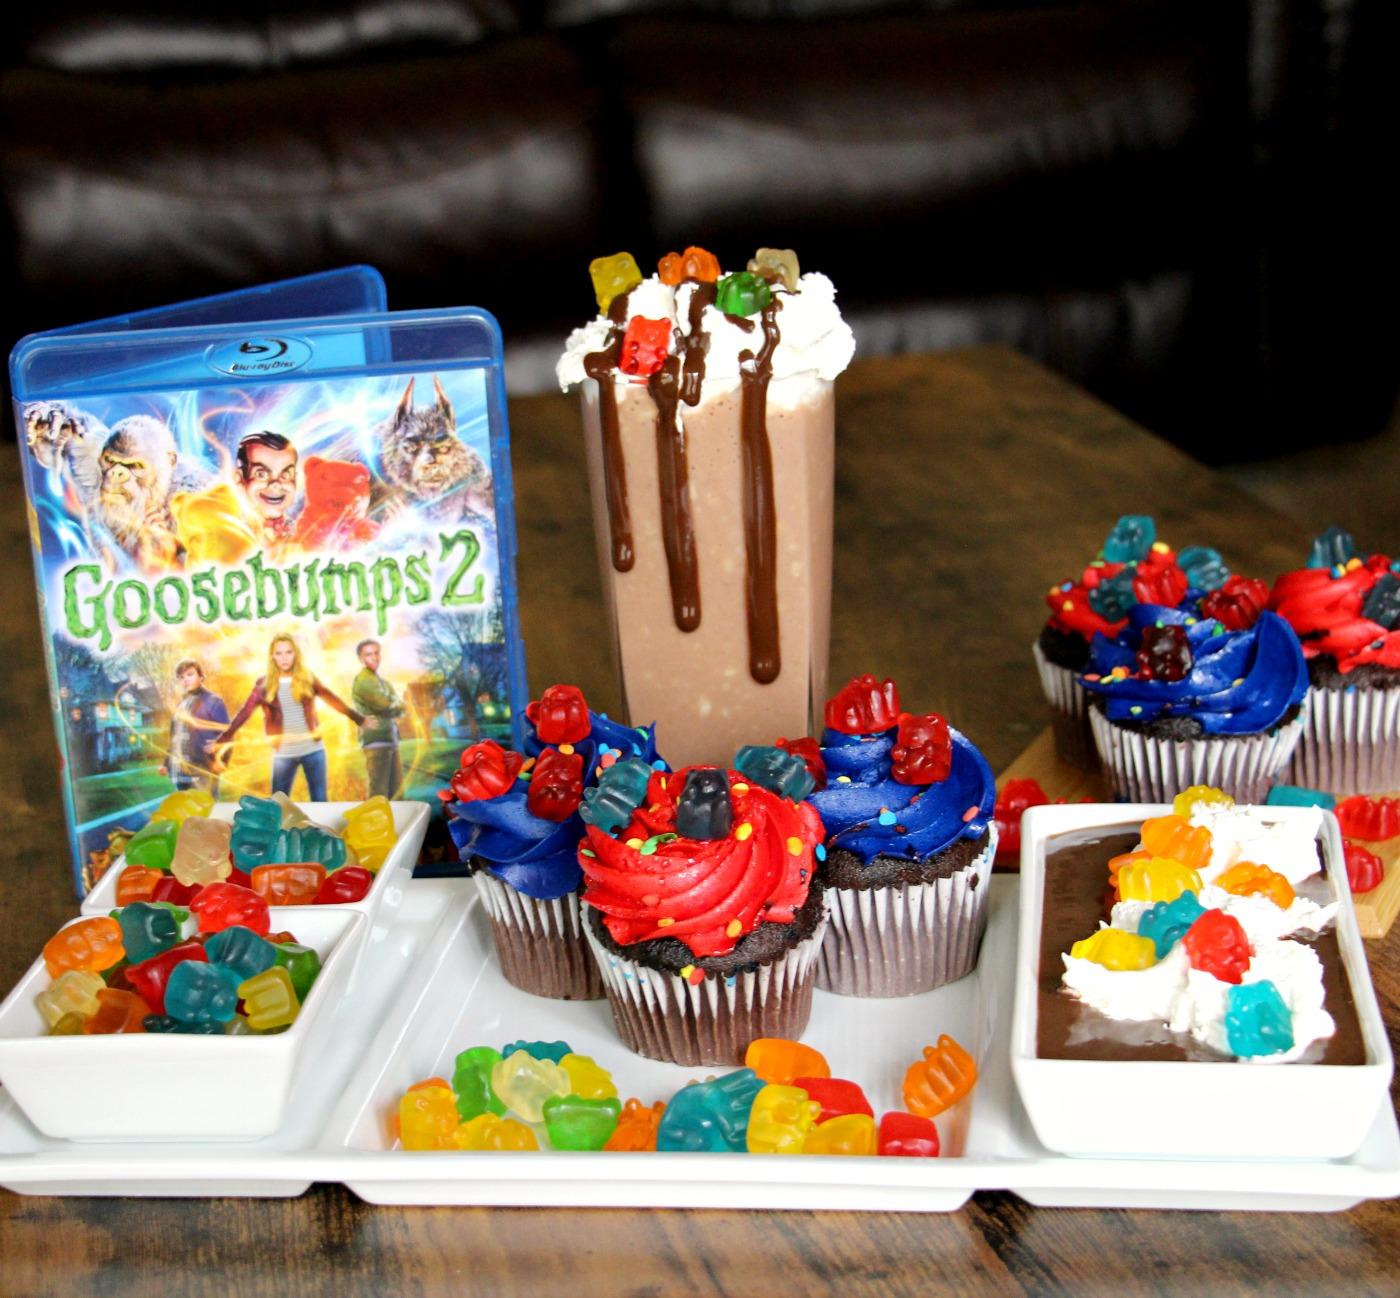 Celebrating Goosebumps 2 With Gummy Bear Snacks